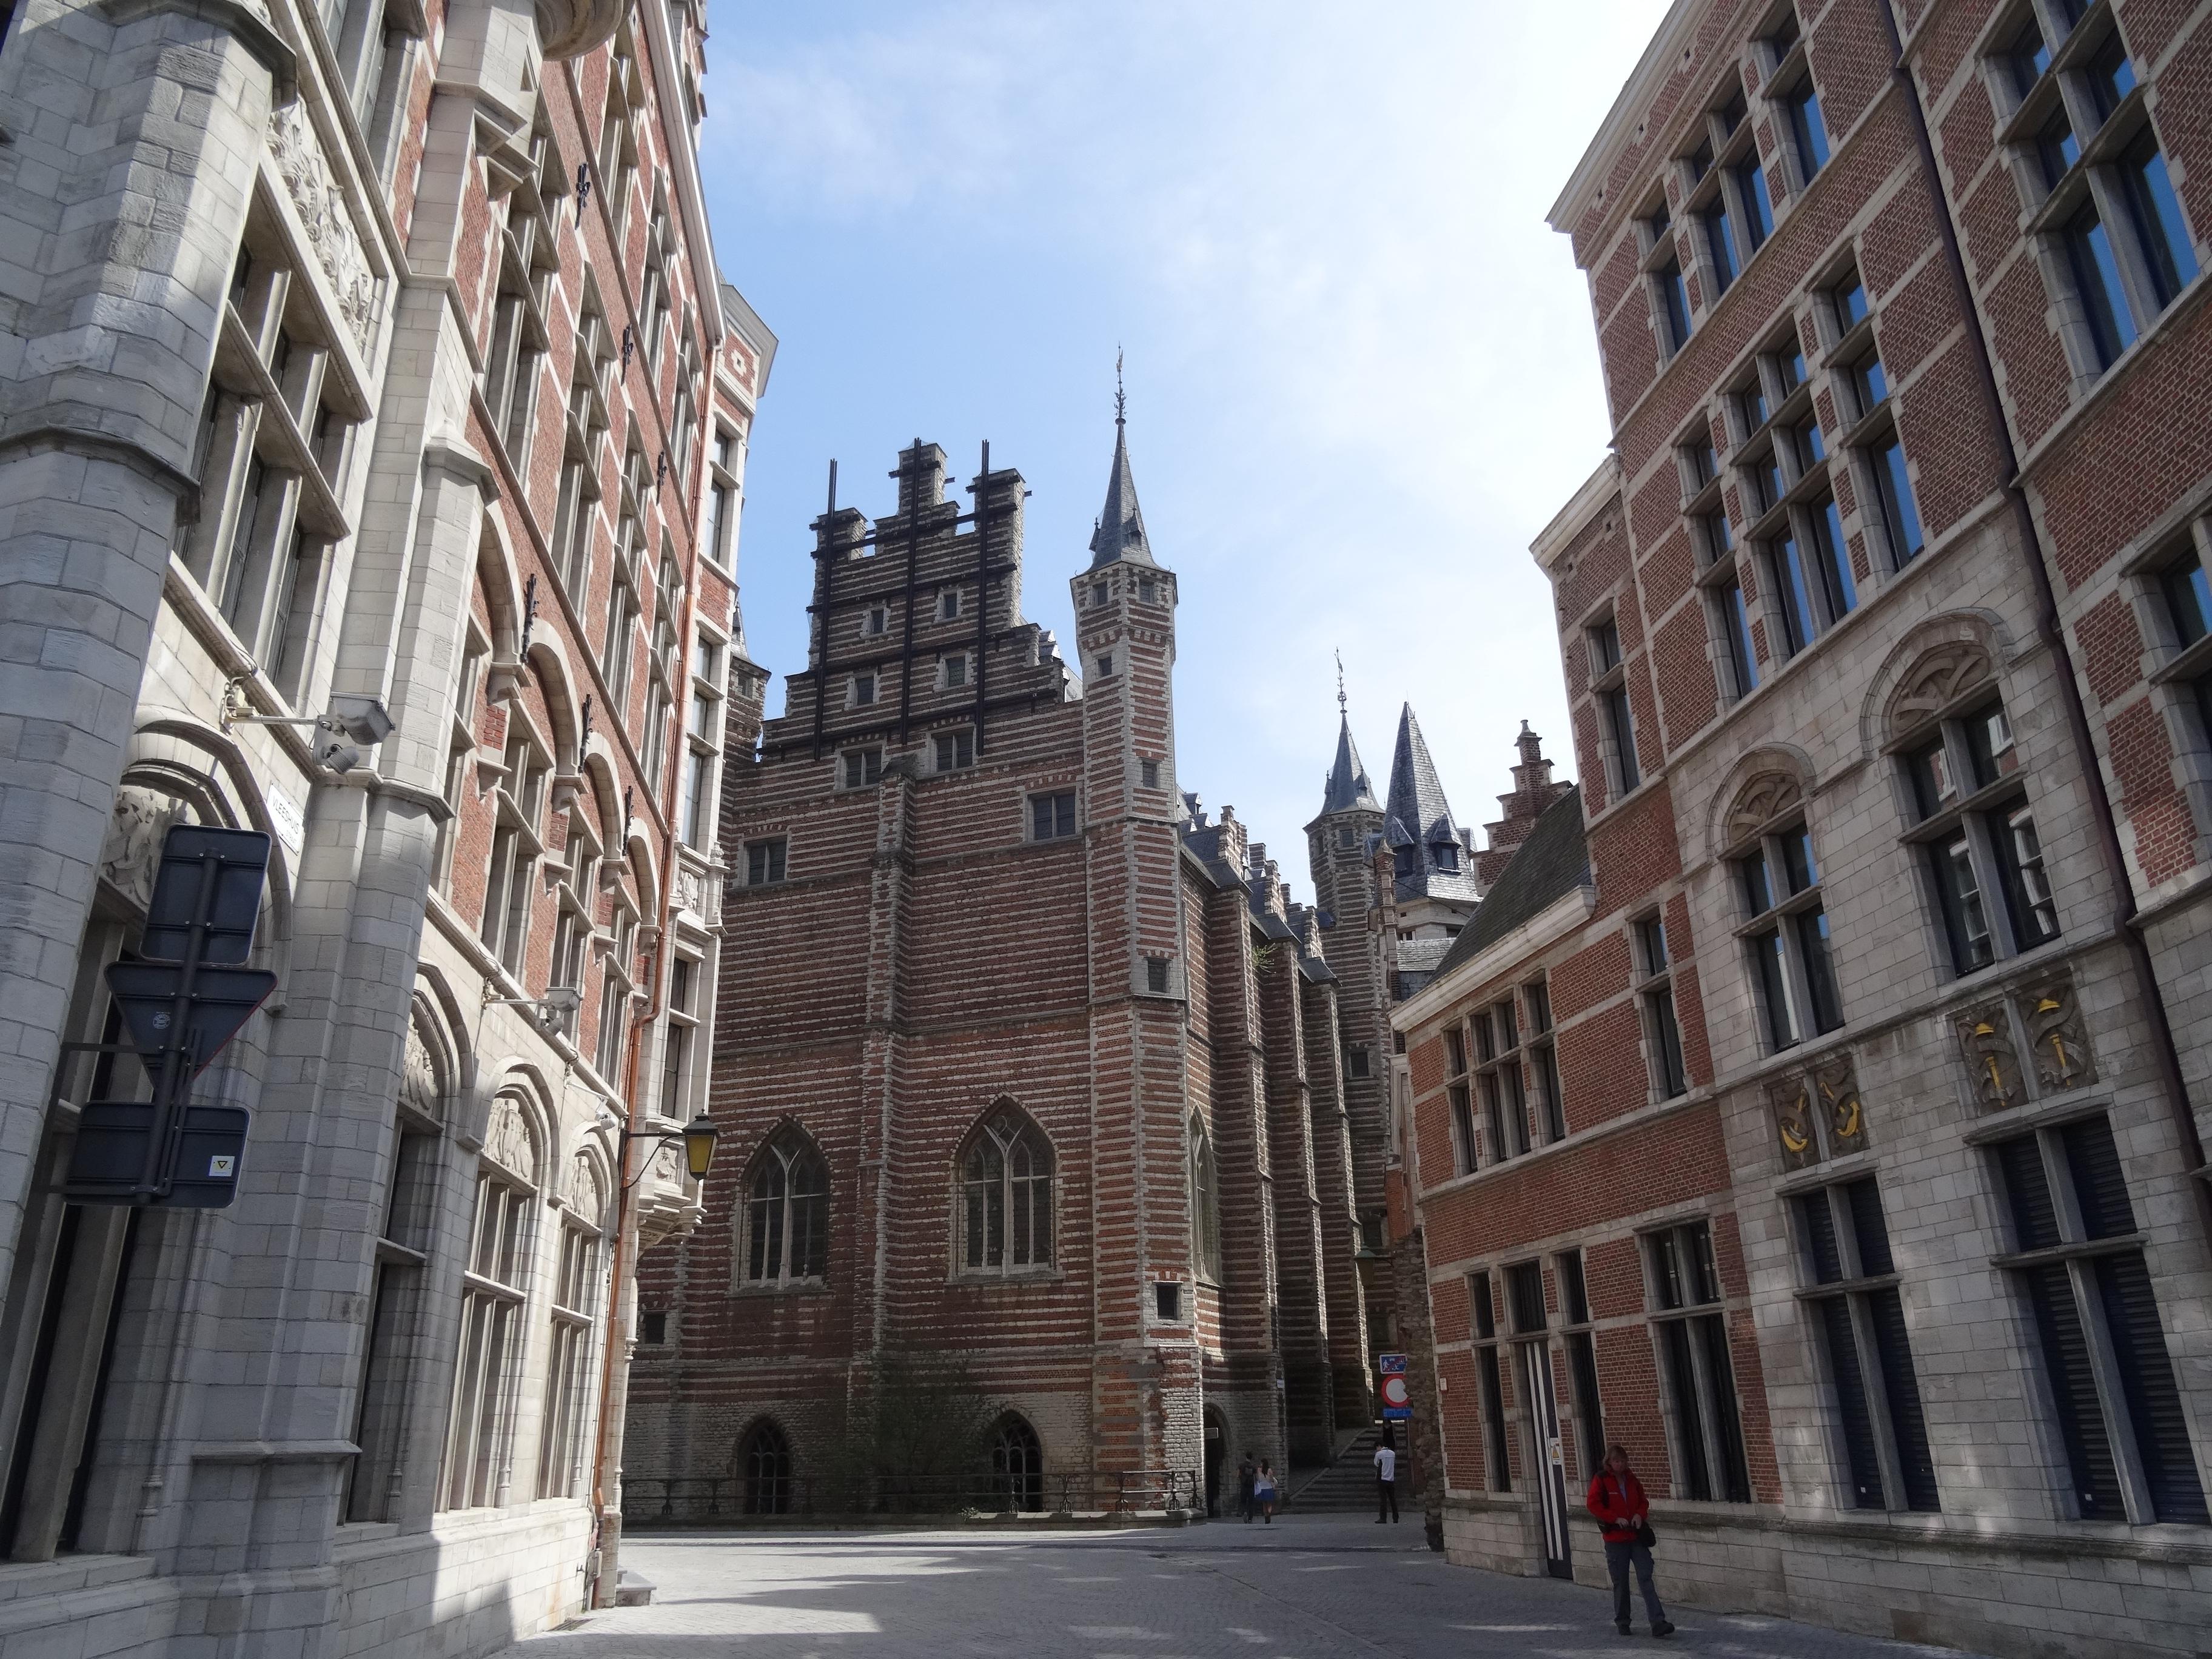 Antwerp Belgium historic center